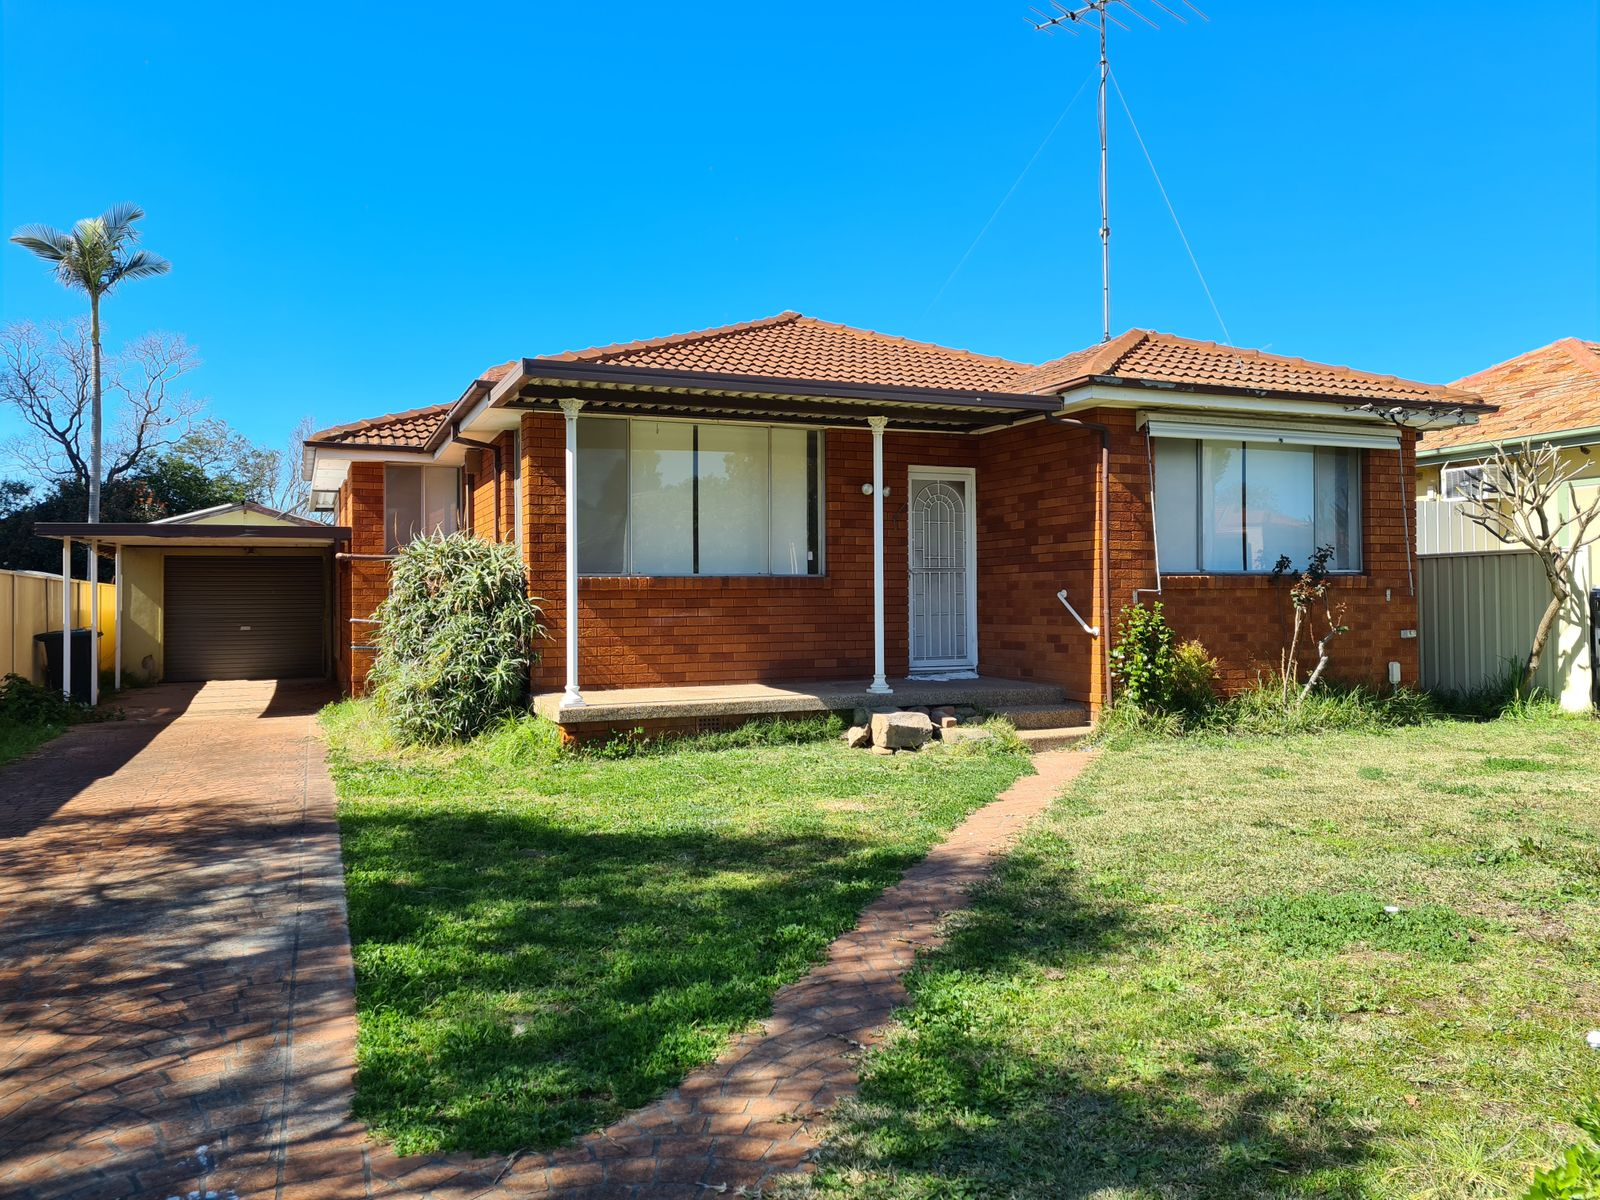 49 Weir Crescent, Lurnea, NSW 2170